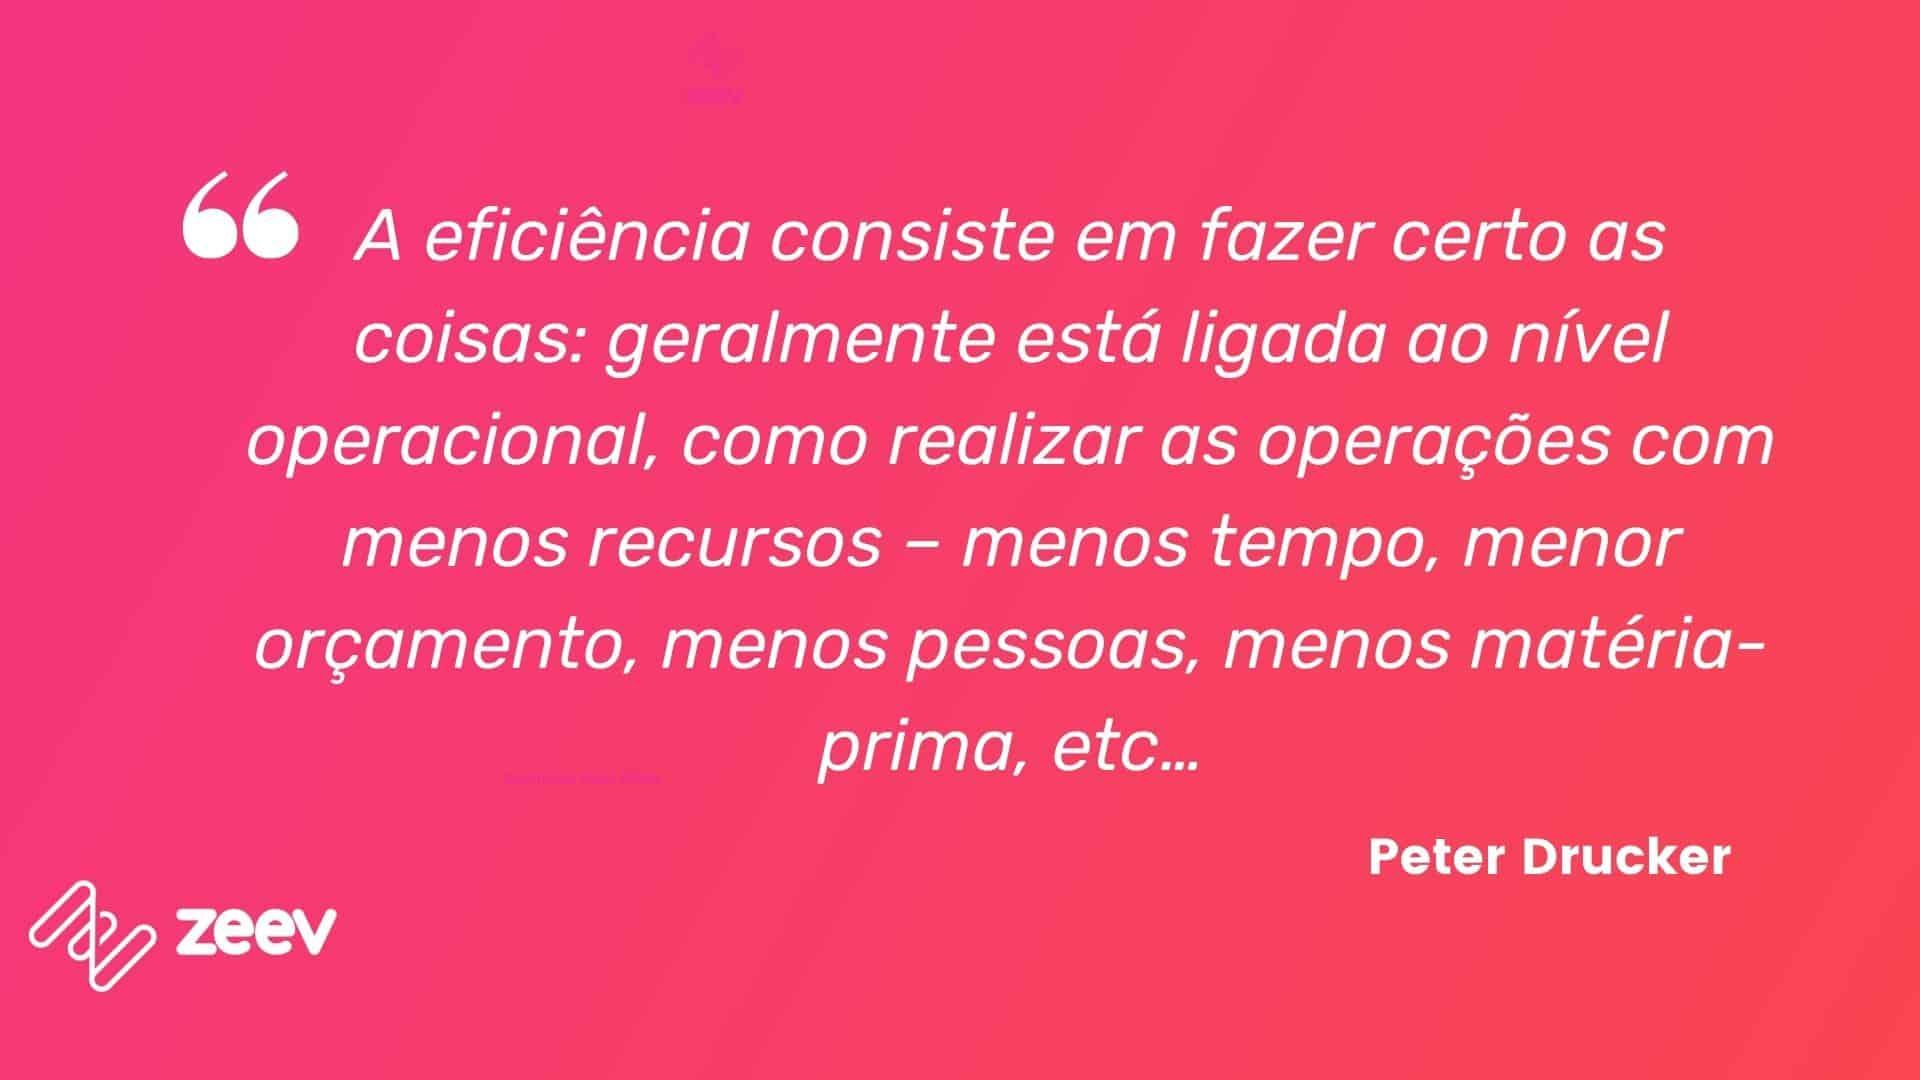 Peter Drucker, eficiência